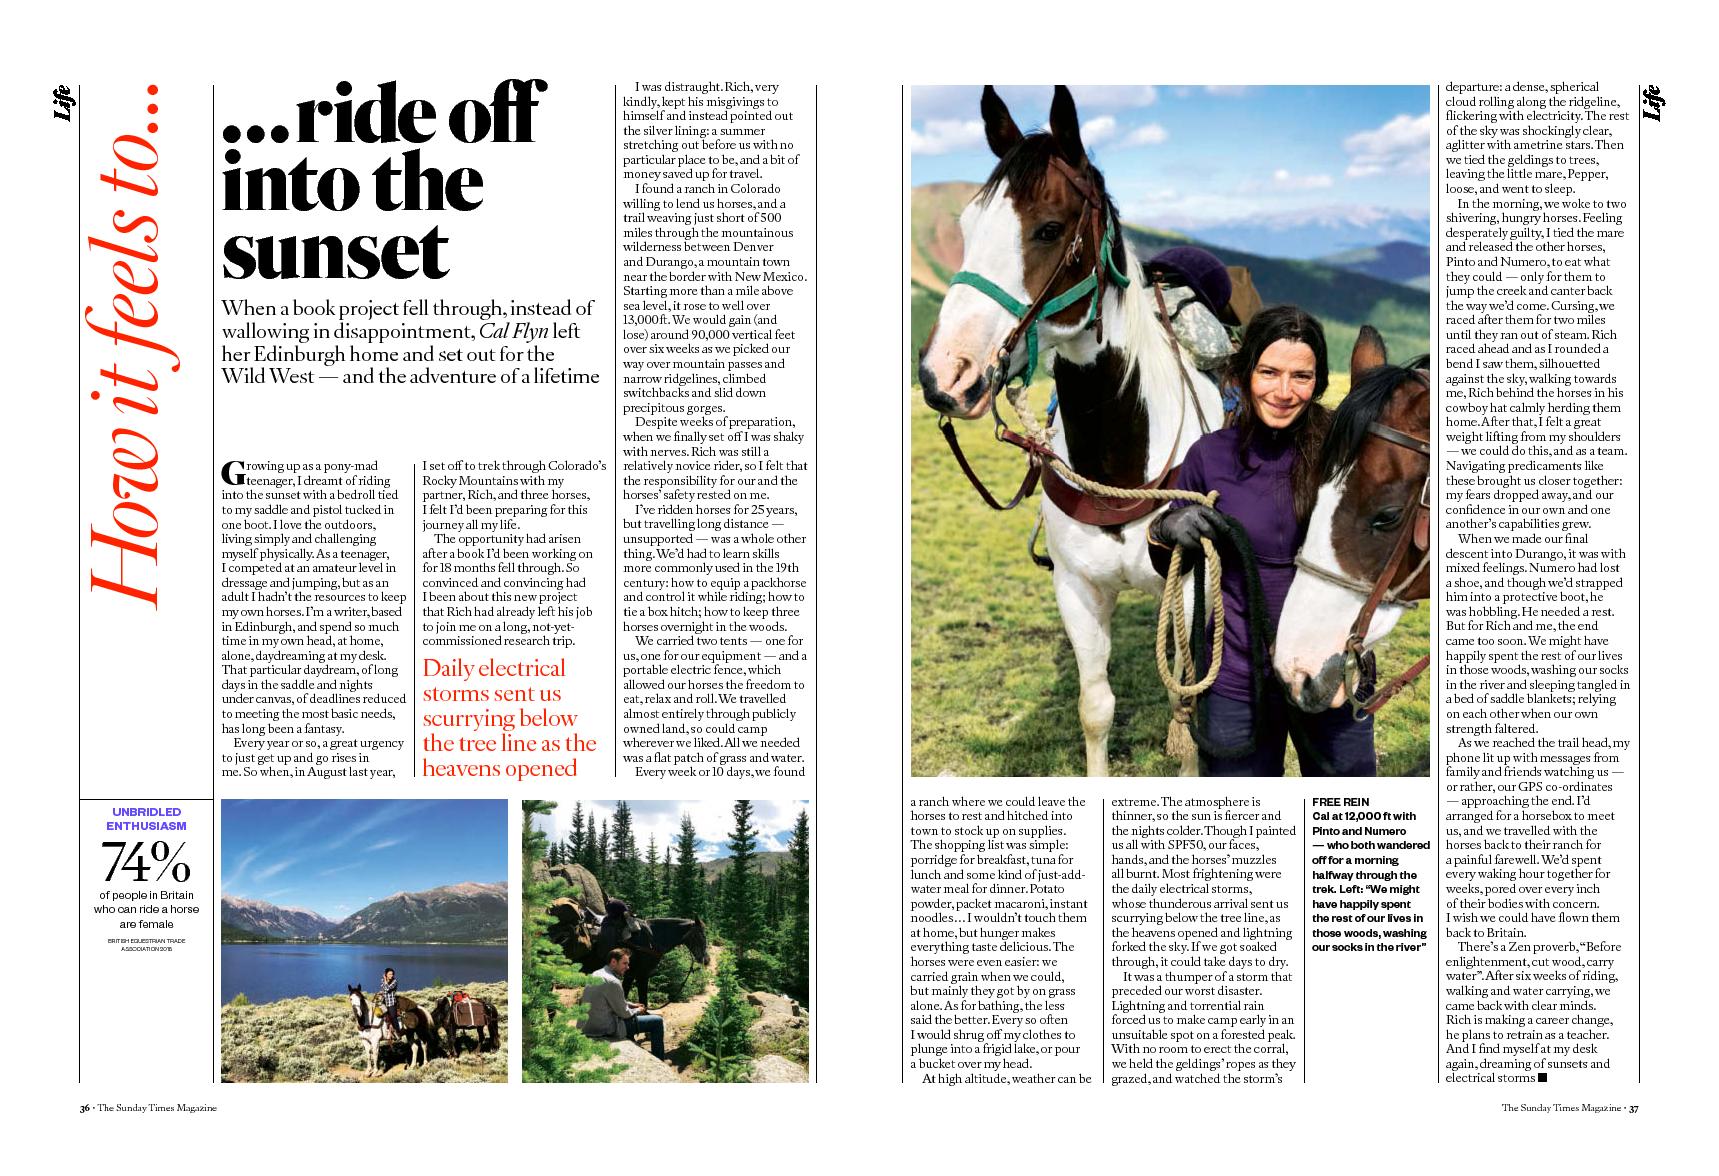 Sunday Times Magazine - Riding into the Sunset